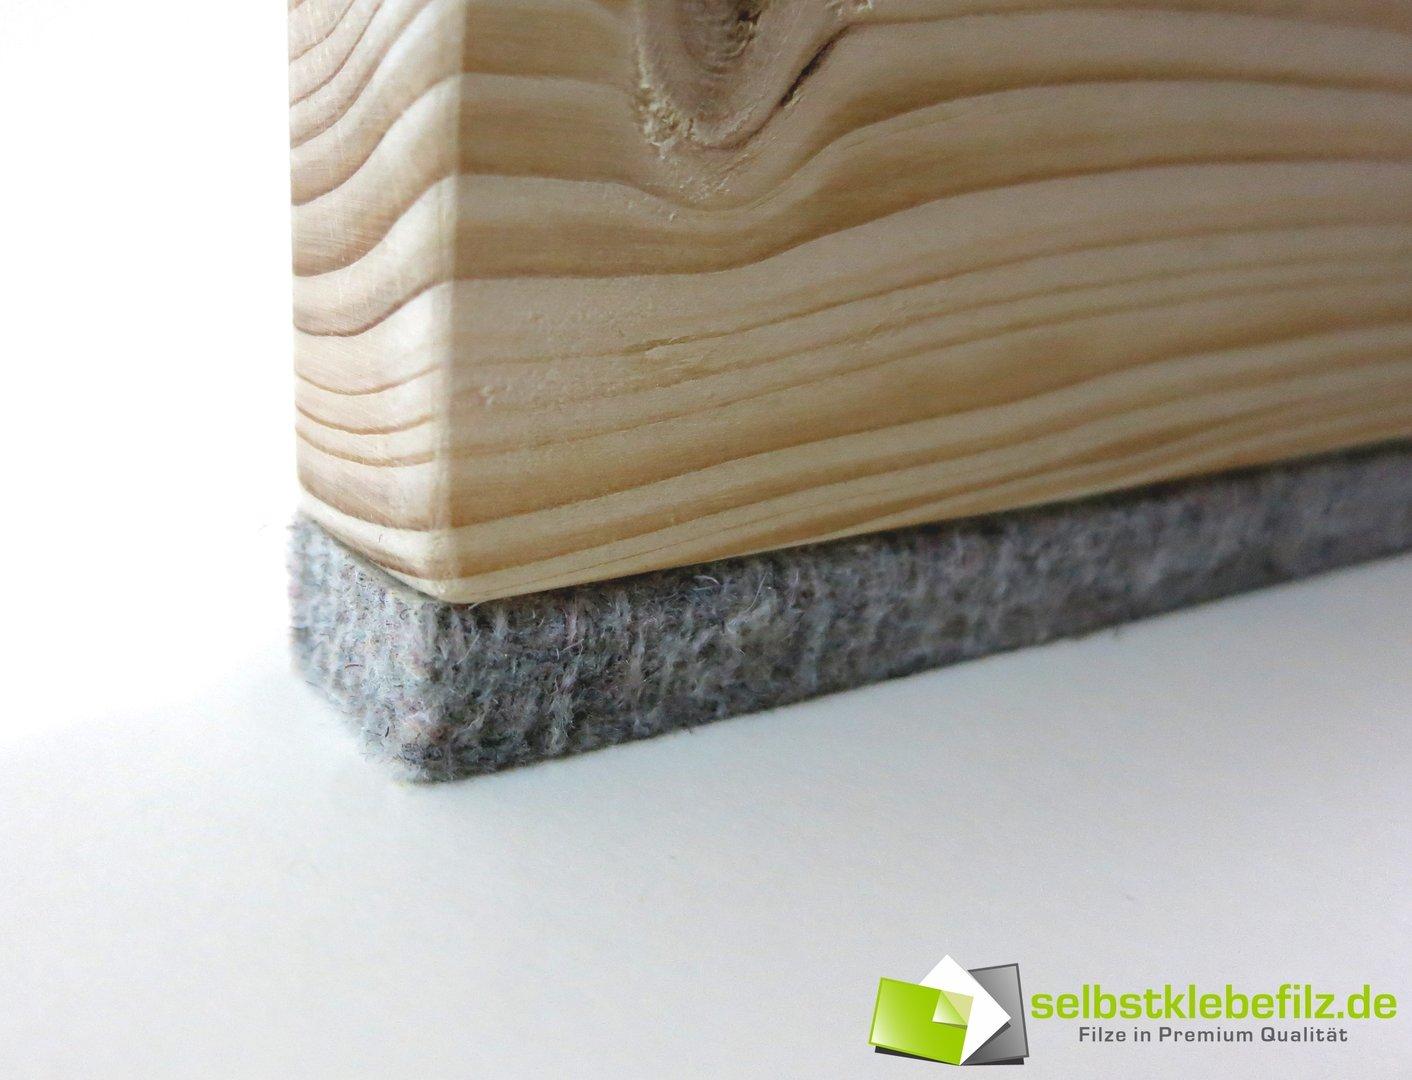 Filzstreifen / Filzband Meterware selbstklebend, 10mm dick   grau meliert